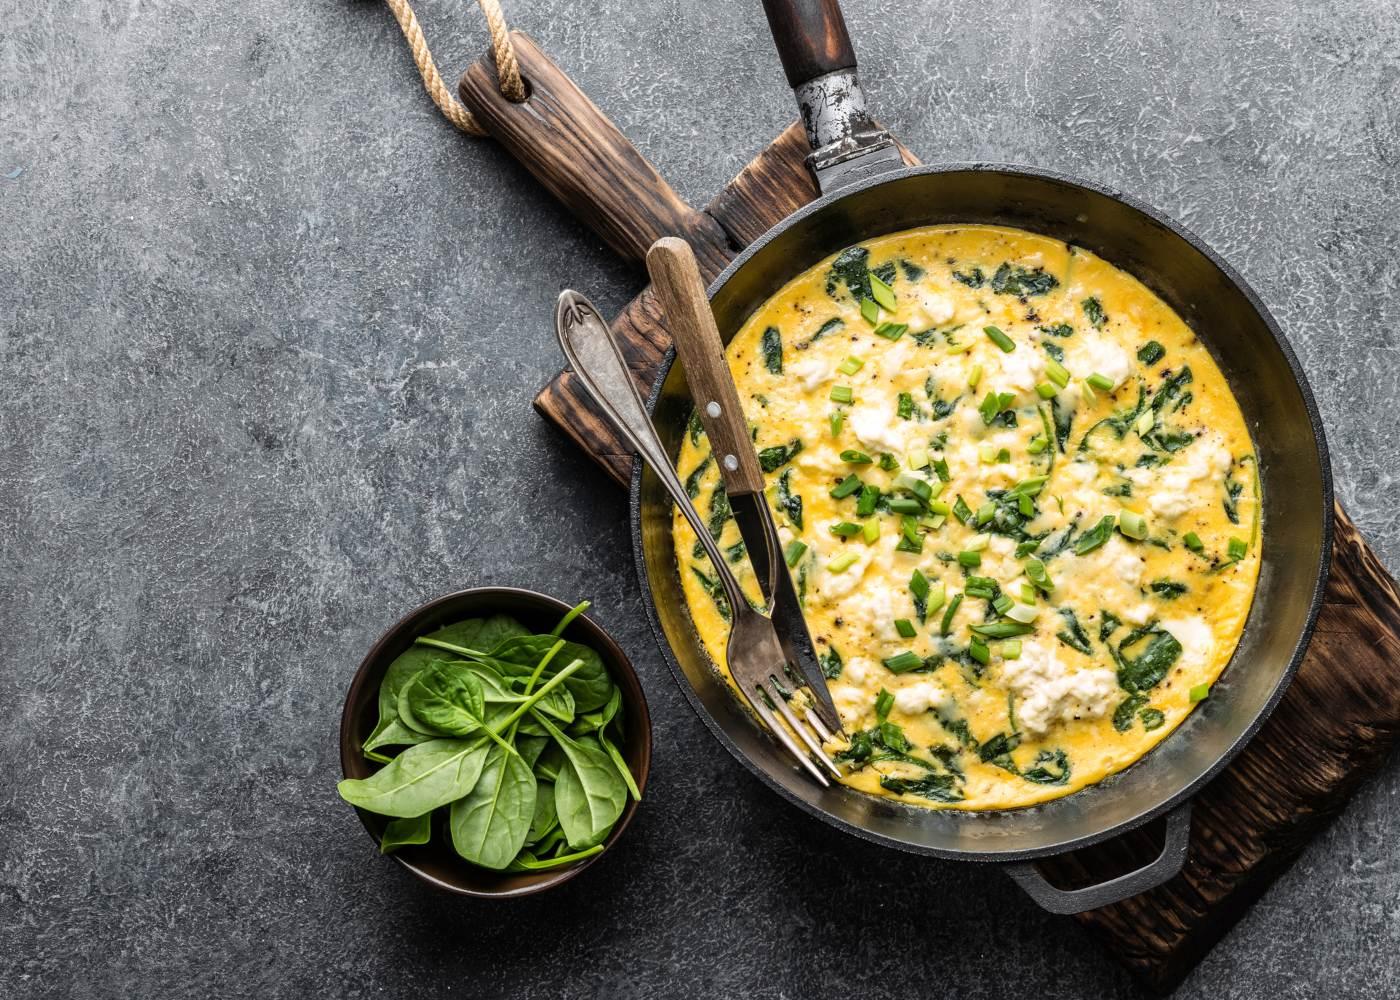 omelete fiambre e espargos